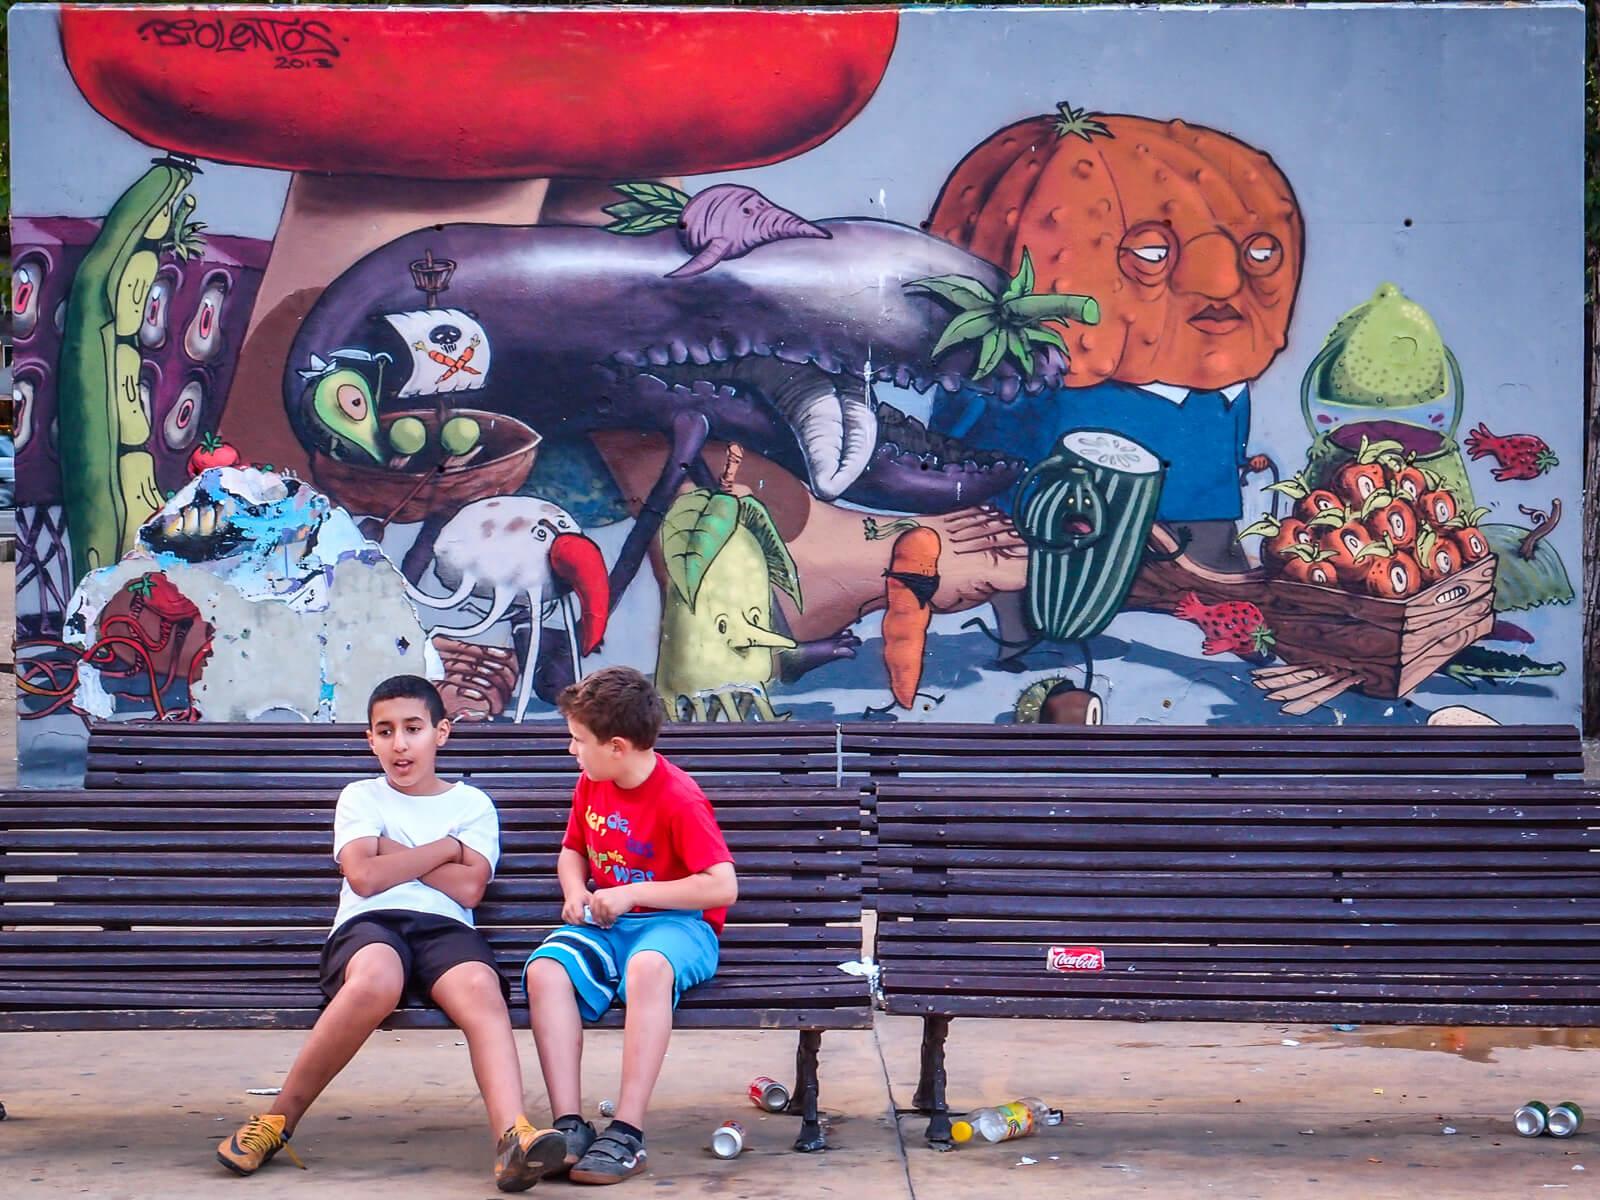 Barcelona Street Photography, Biolentos 2012 vegetables, street art mural